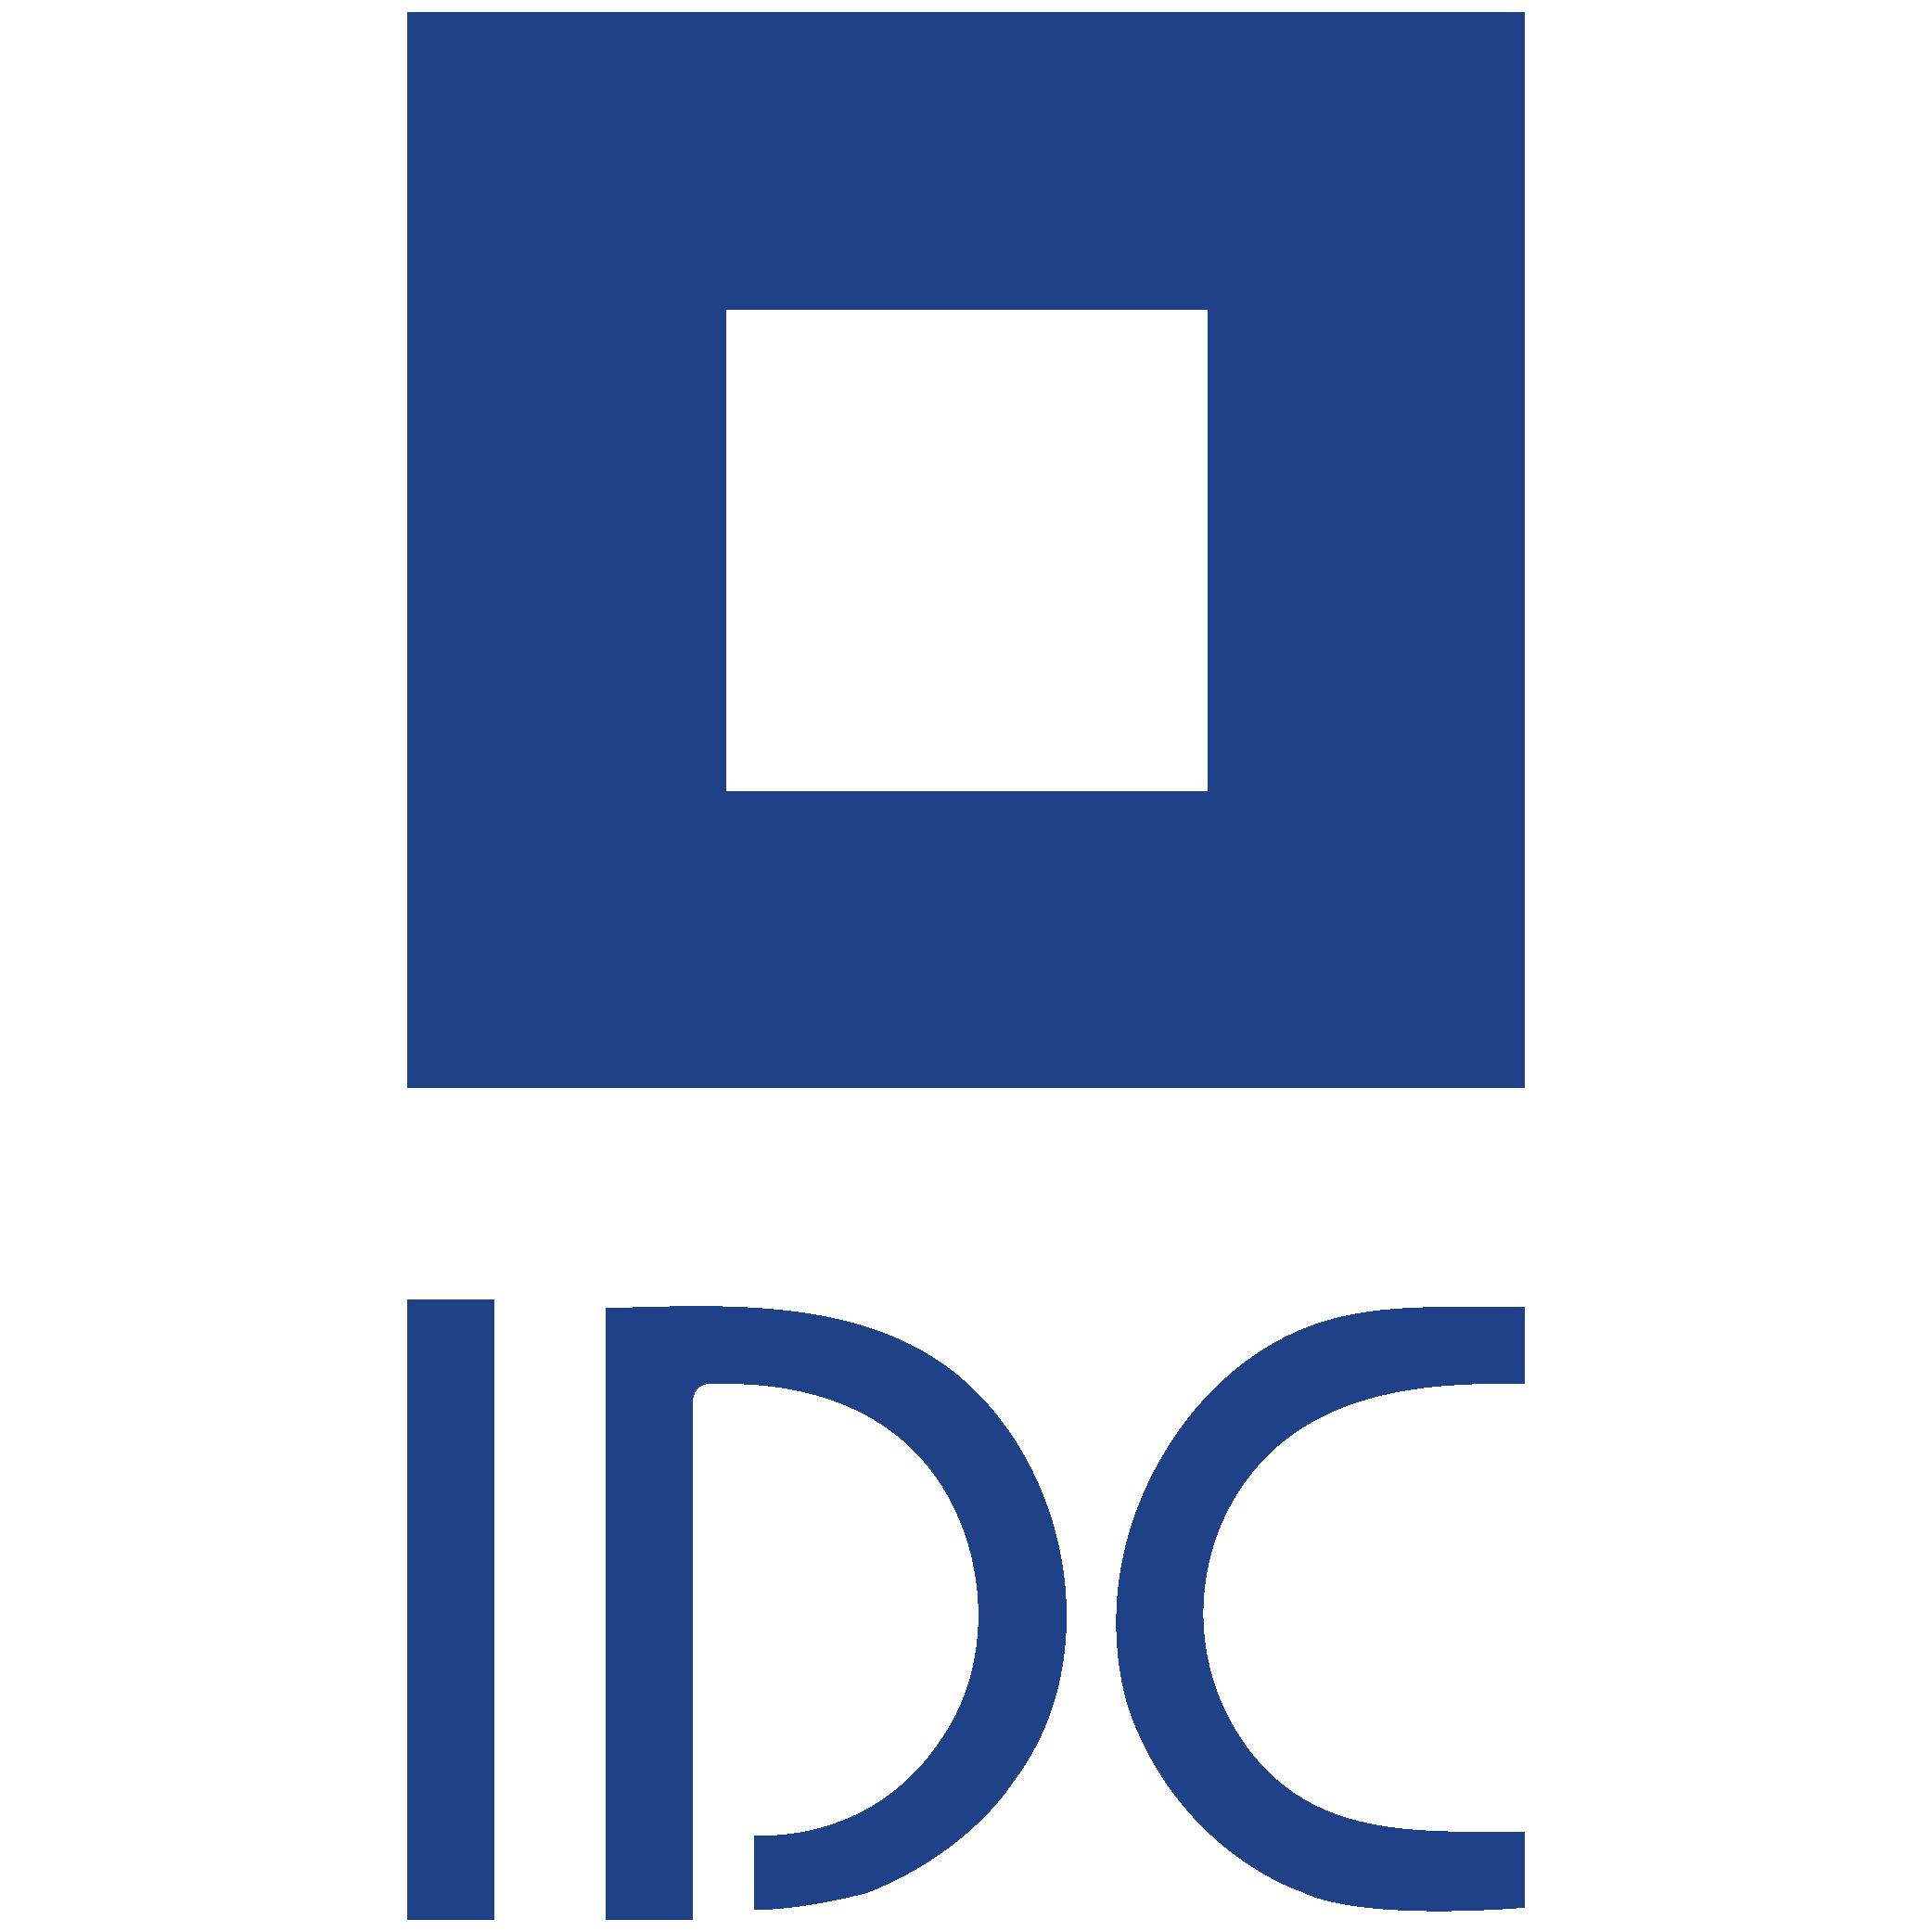 Copia de IDC